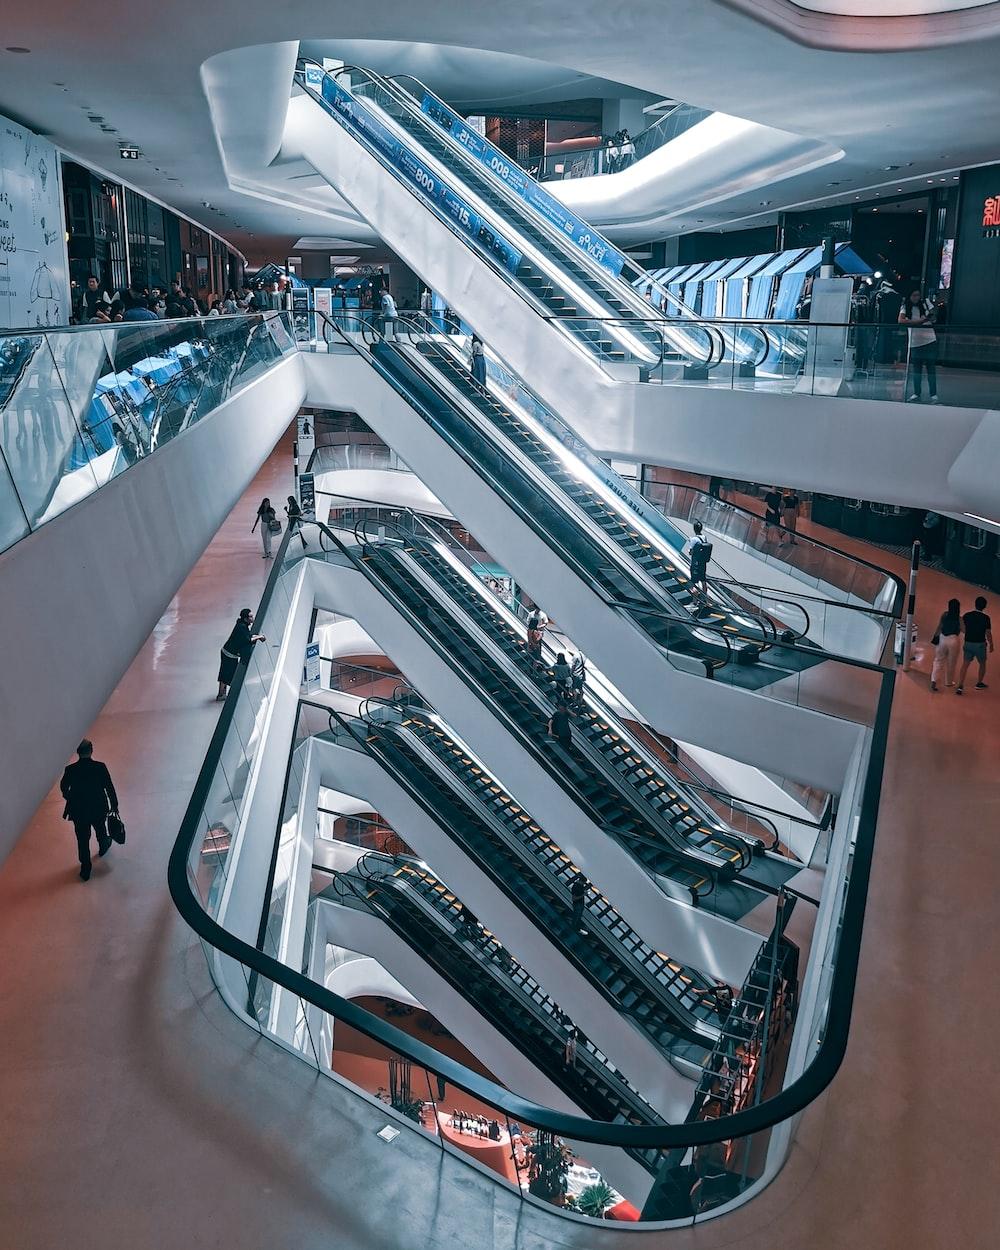 people in mall near escalators